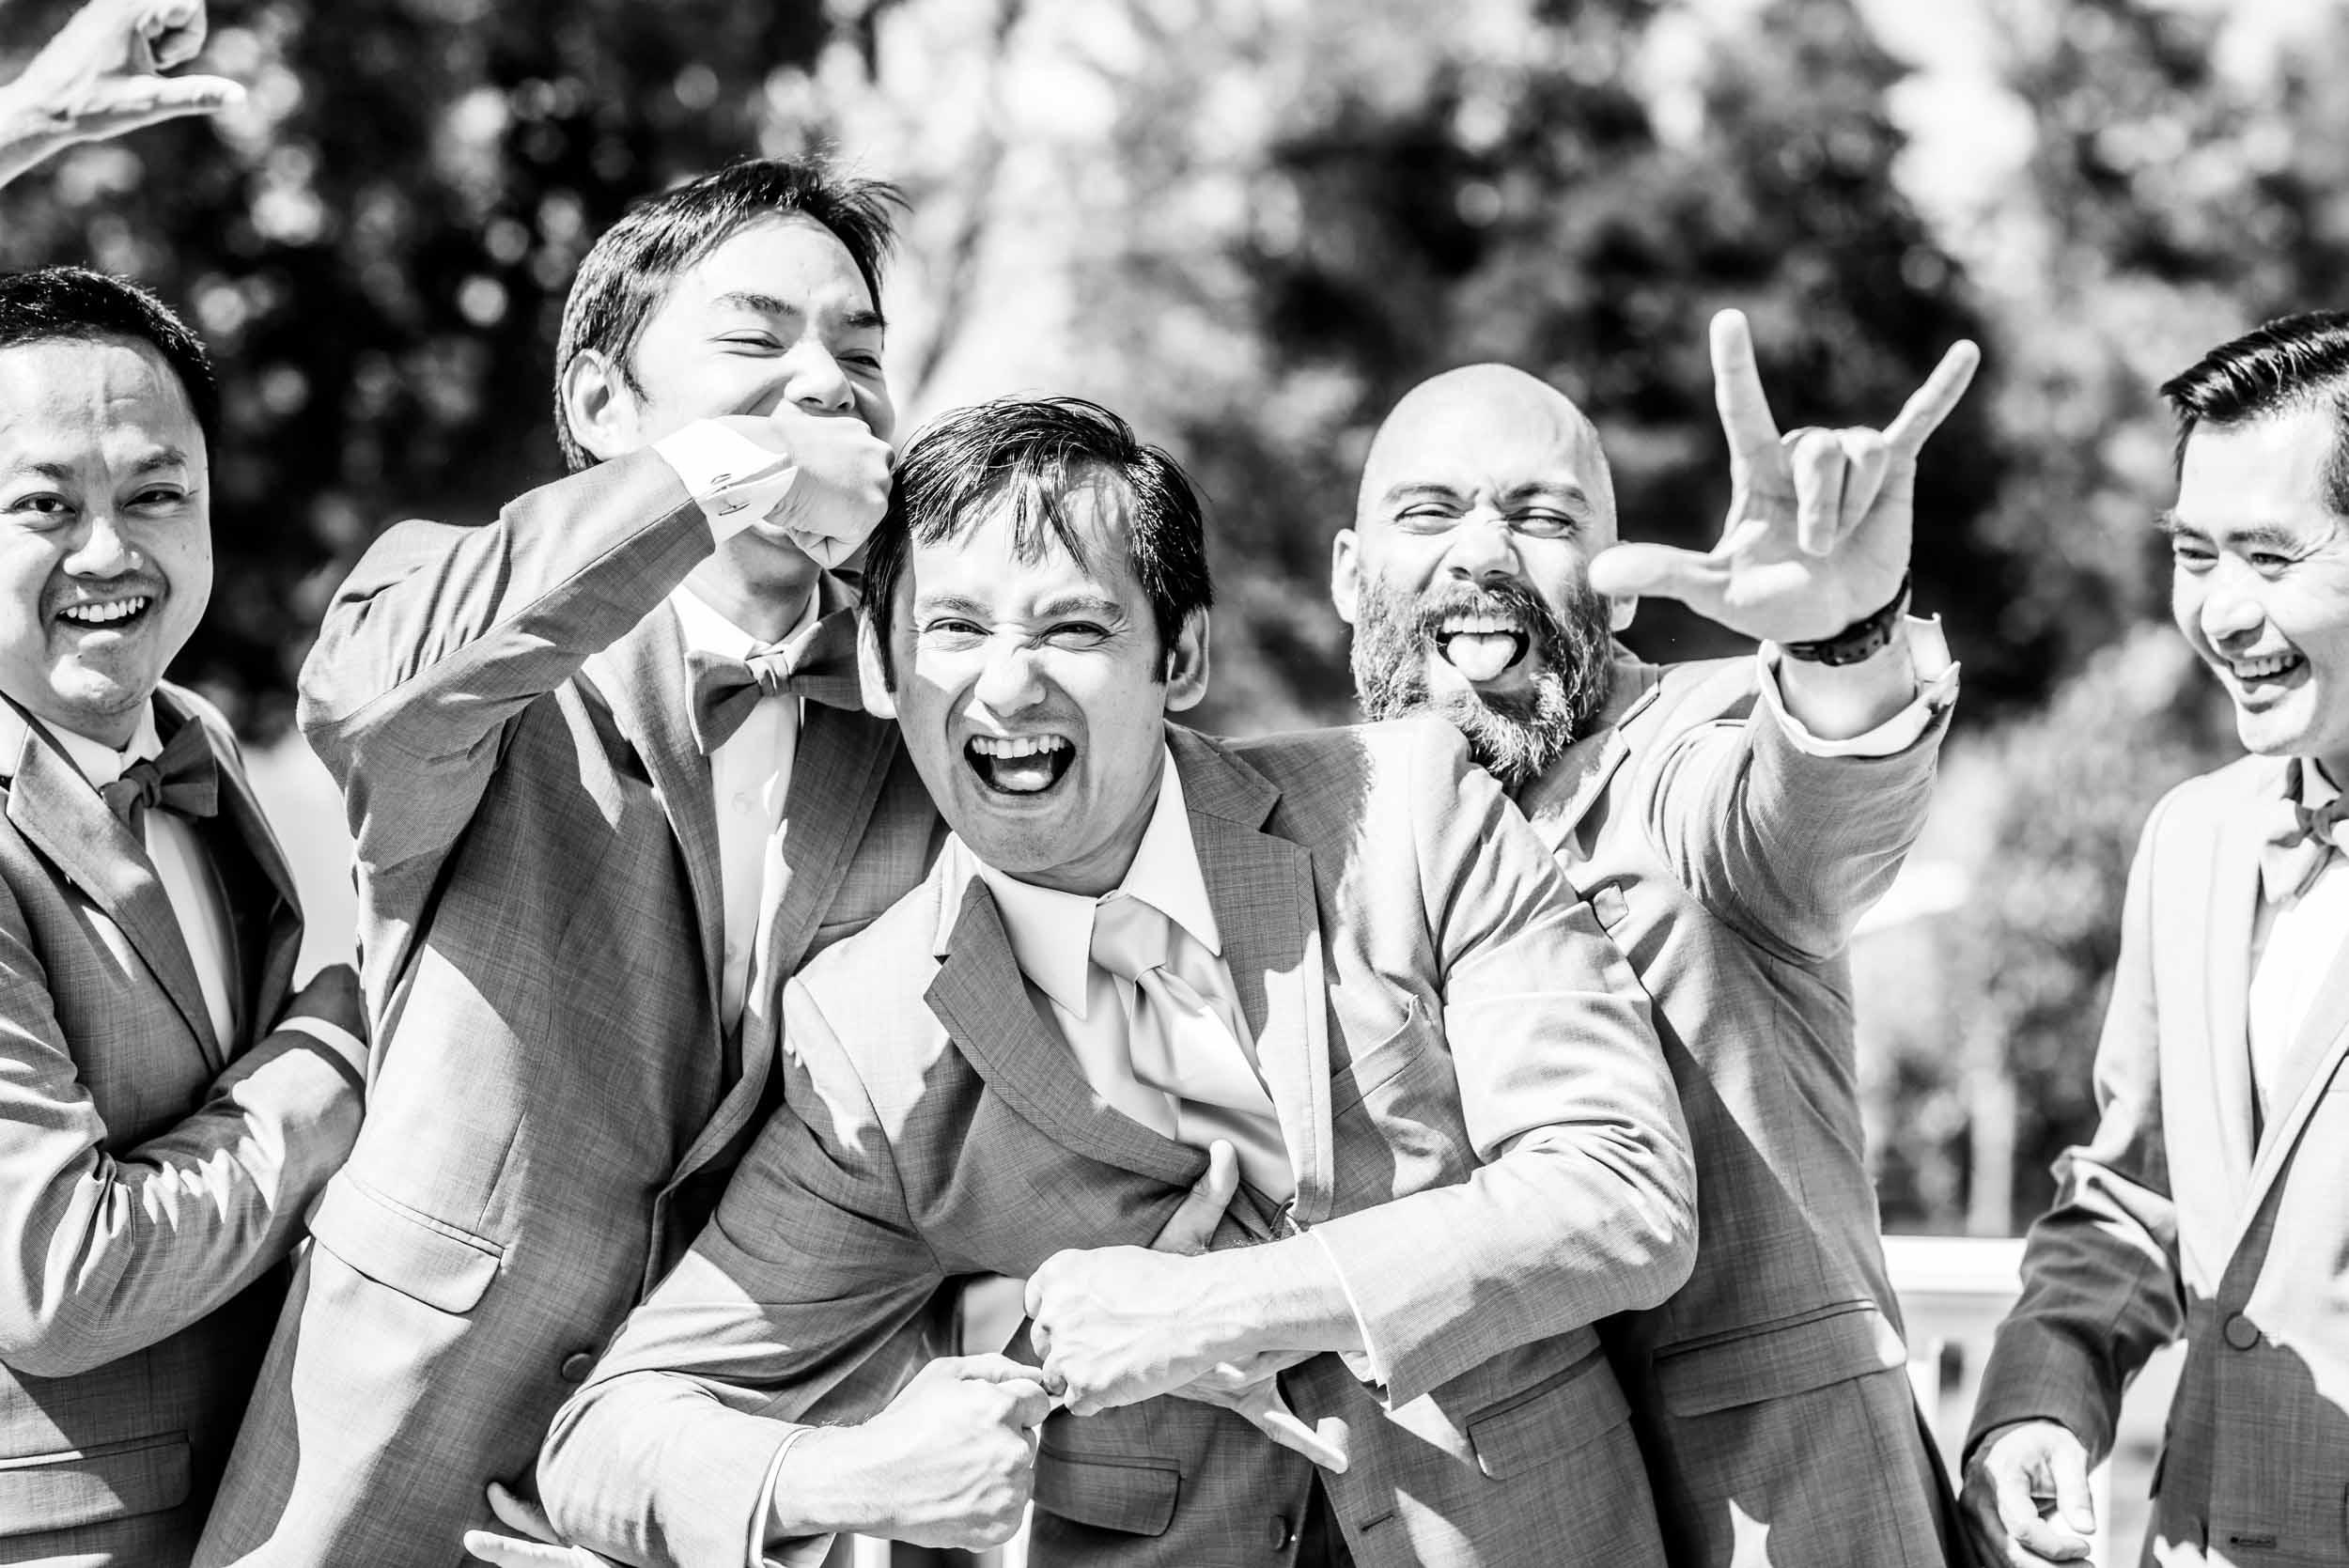 dc+metro+wedding+photographer+vadym+guliuk+photography+weddings+groomsmen-2026.jpg